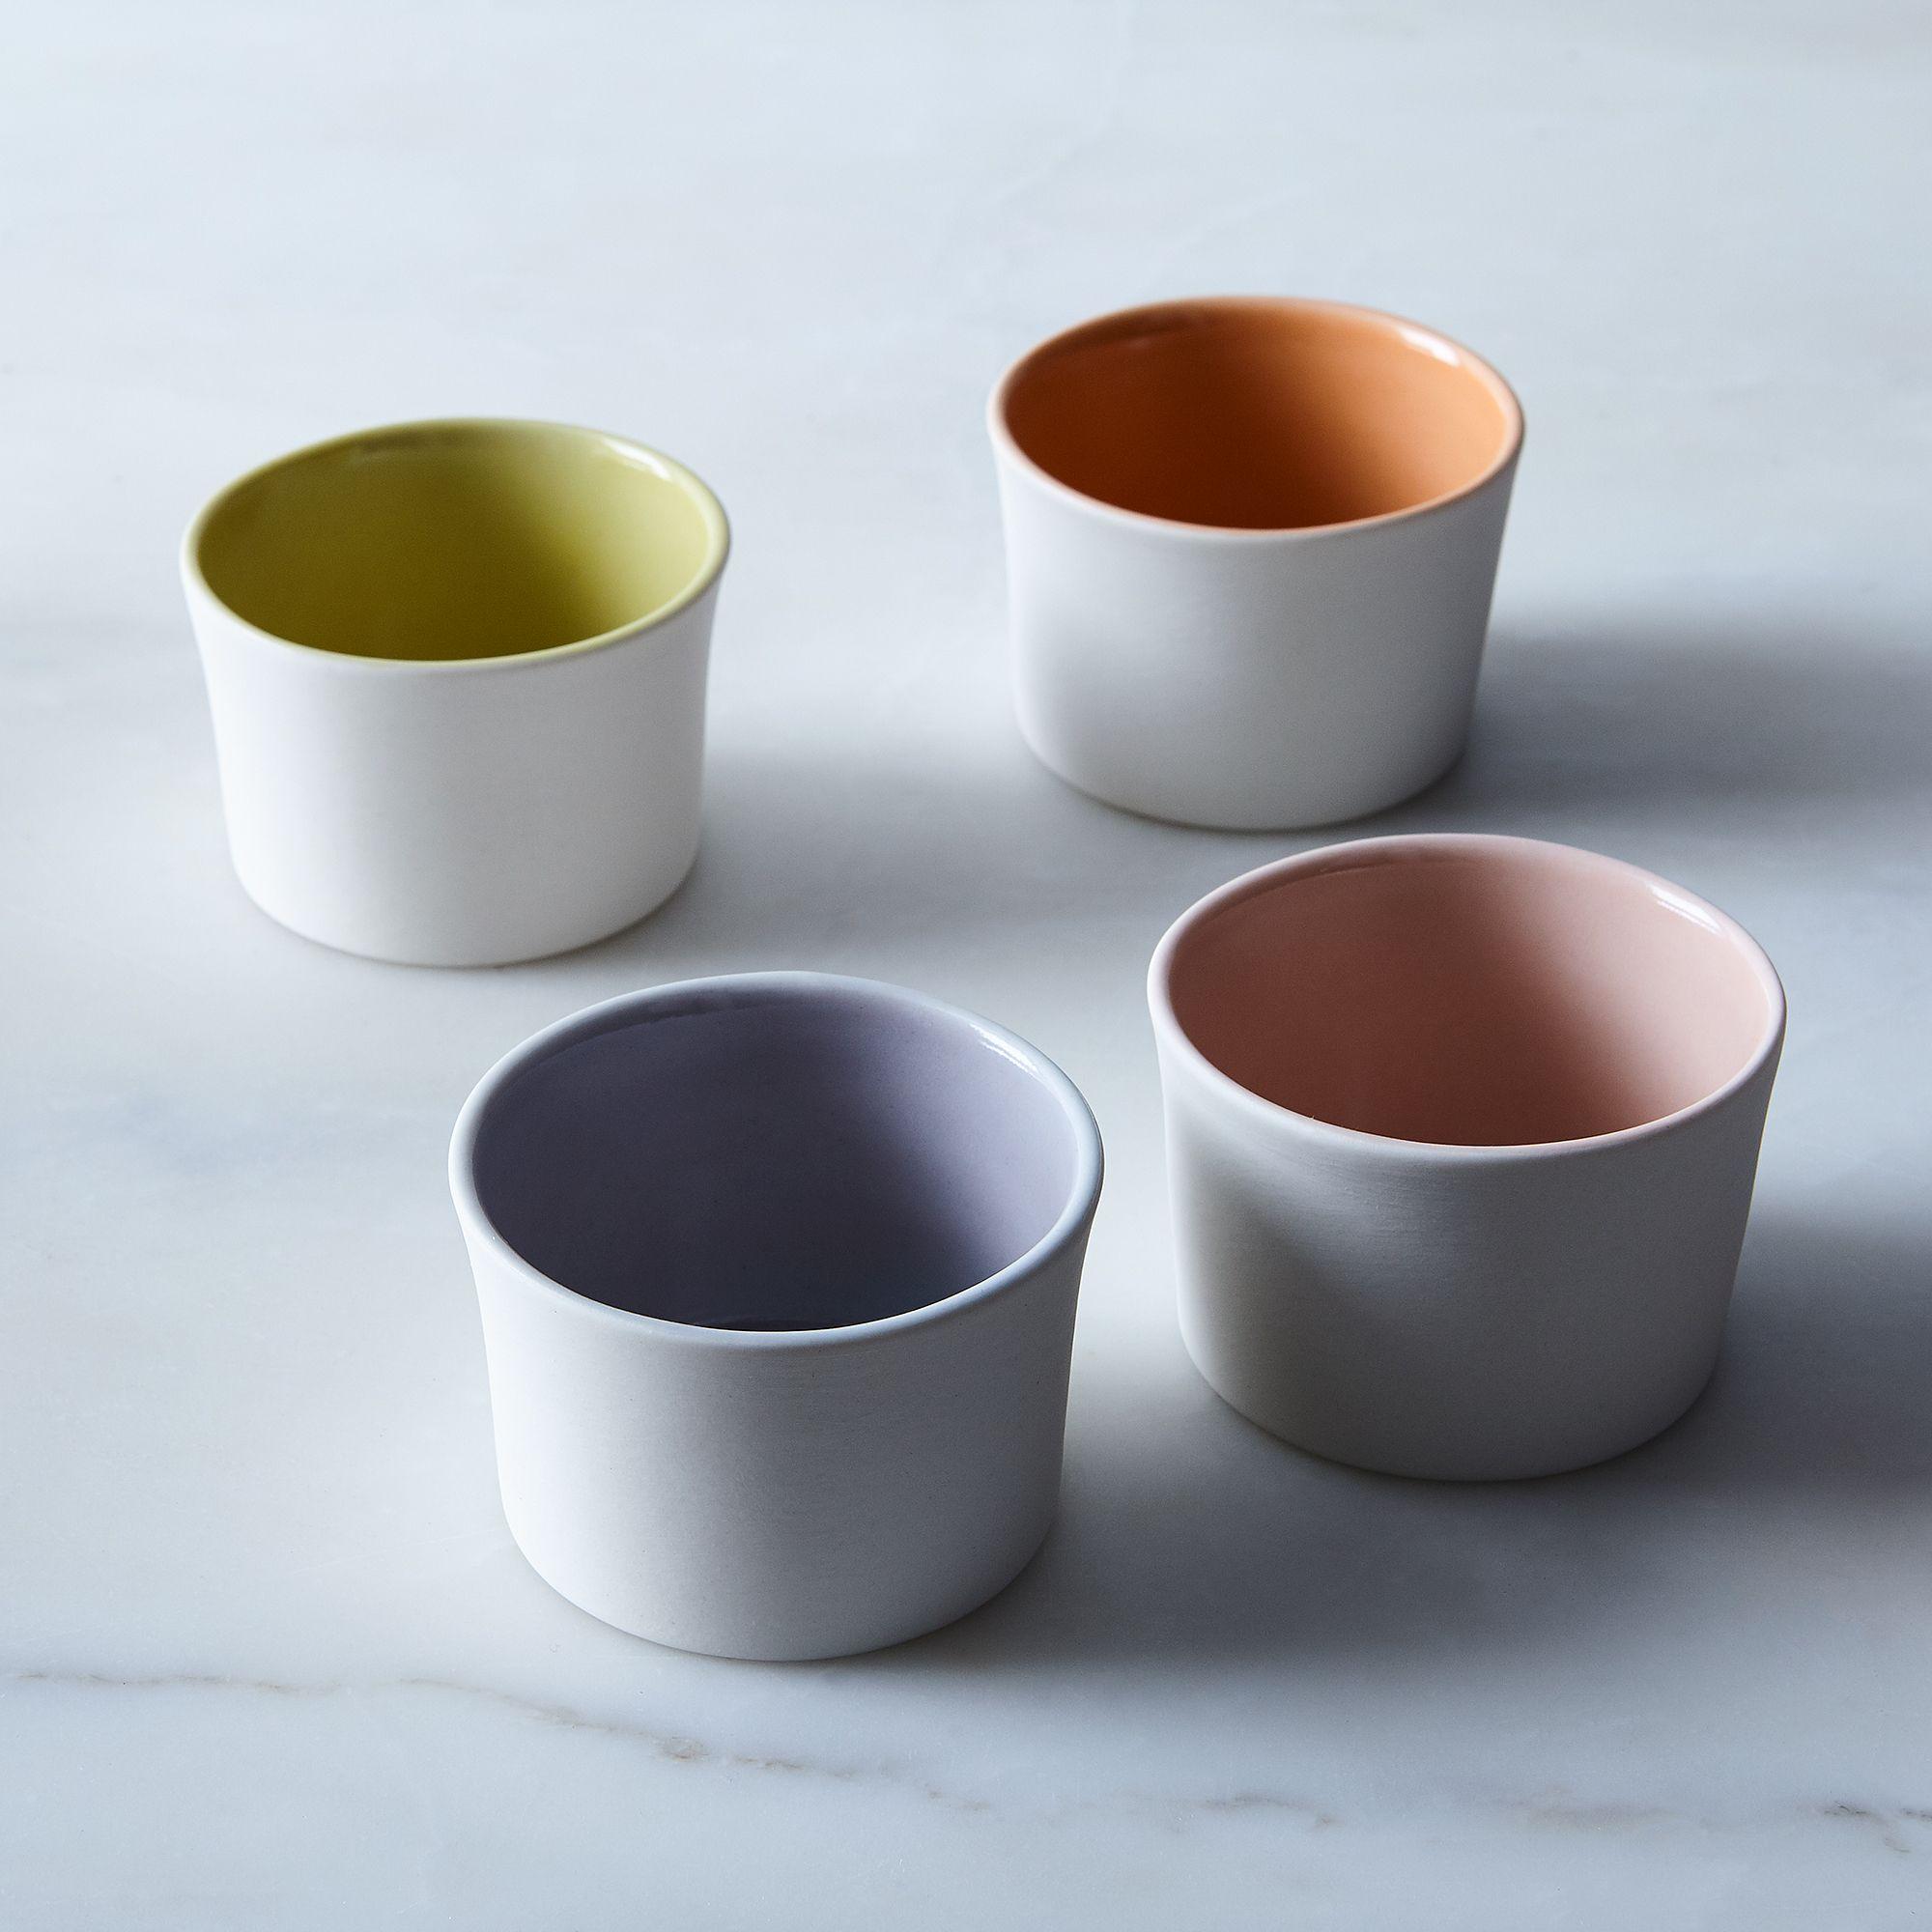 0a3c8671 538c 4f1d 8fd2 d01491f15c00  2017 0606 gleena ceramics porcelain gelato bowls silo rocky luten 022